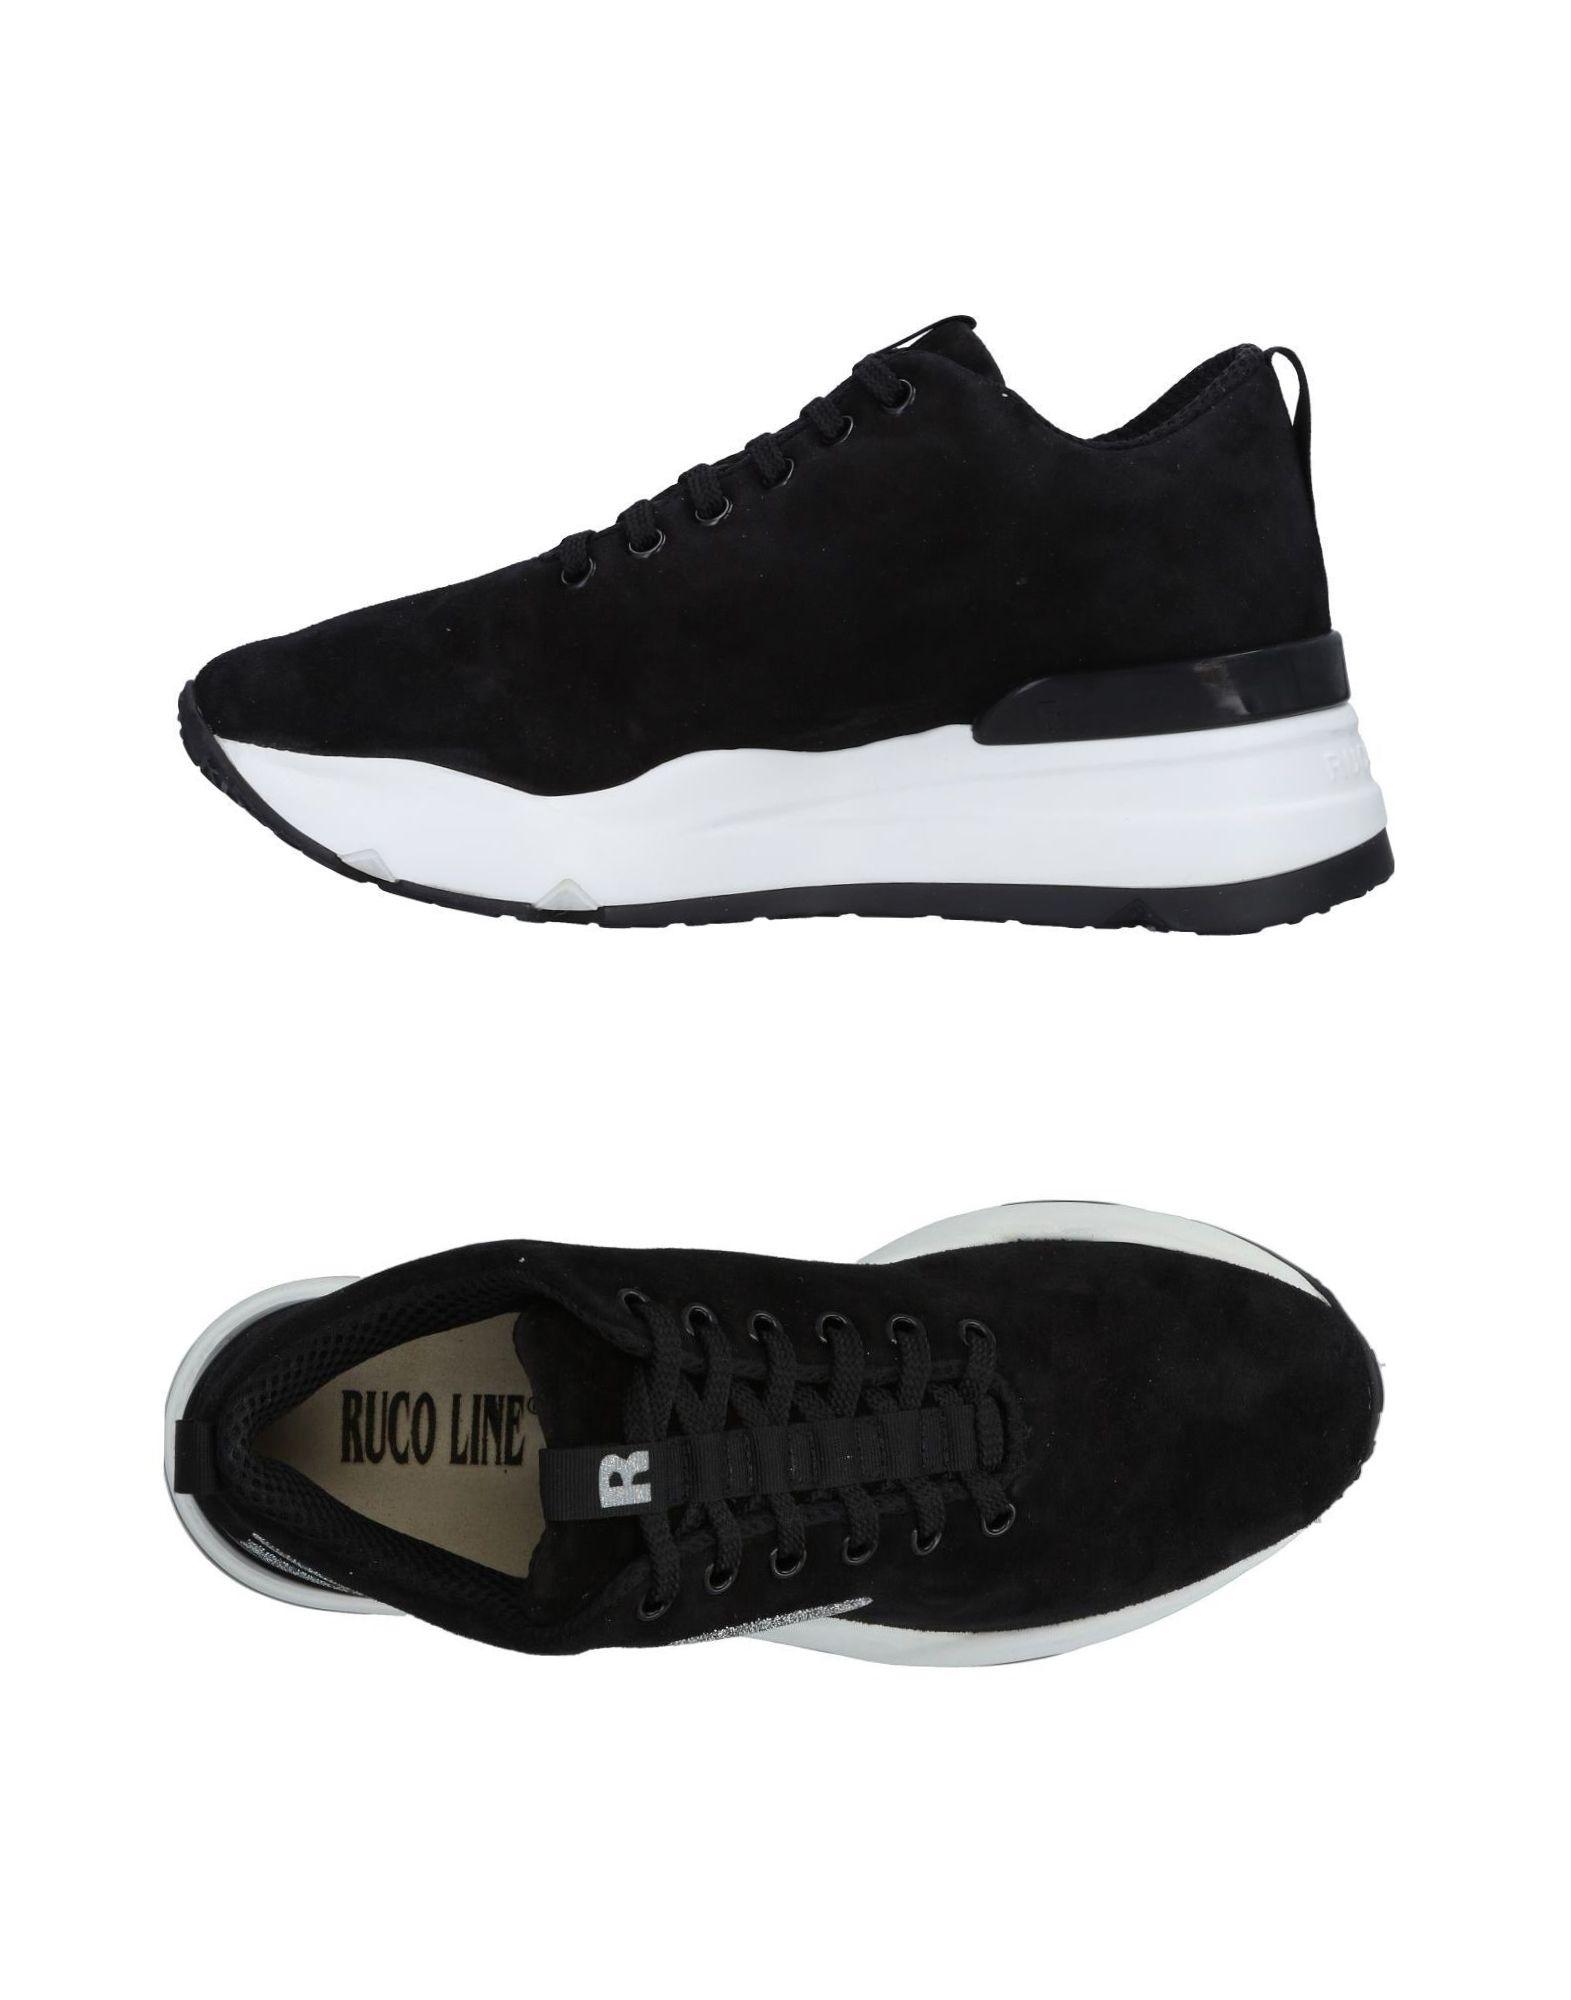 Stilvolle billige Damen Schuhe Ruco Line Sneakers Damen billige  11495678FF 363888